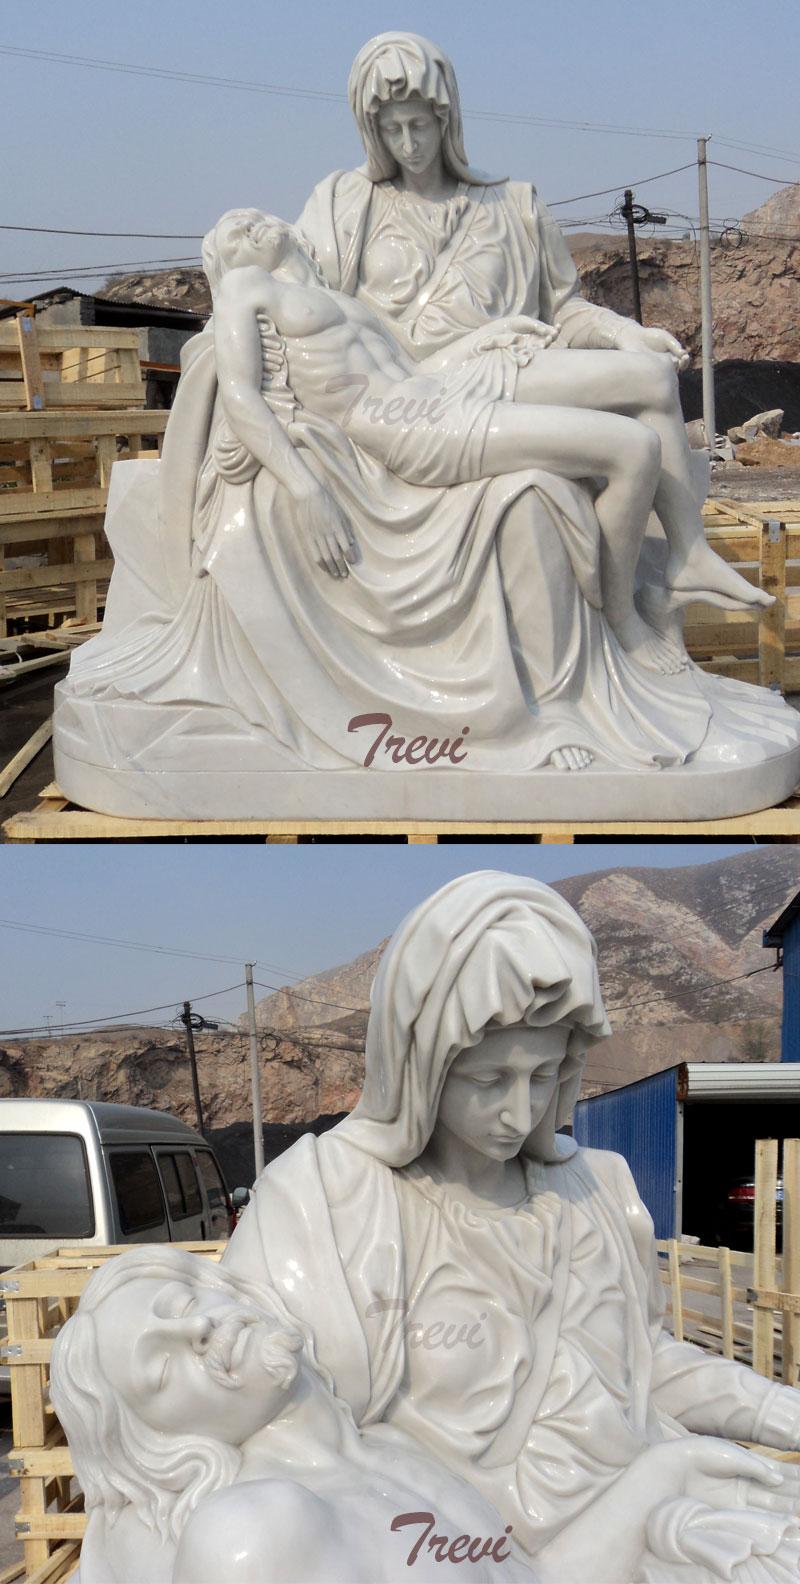 Church religious garden statues of Michelangelo's Pieta replication